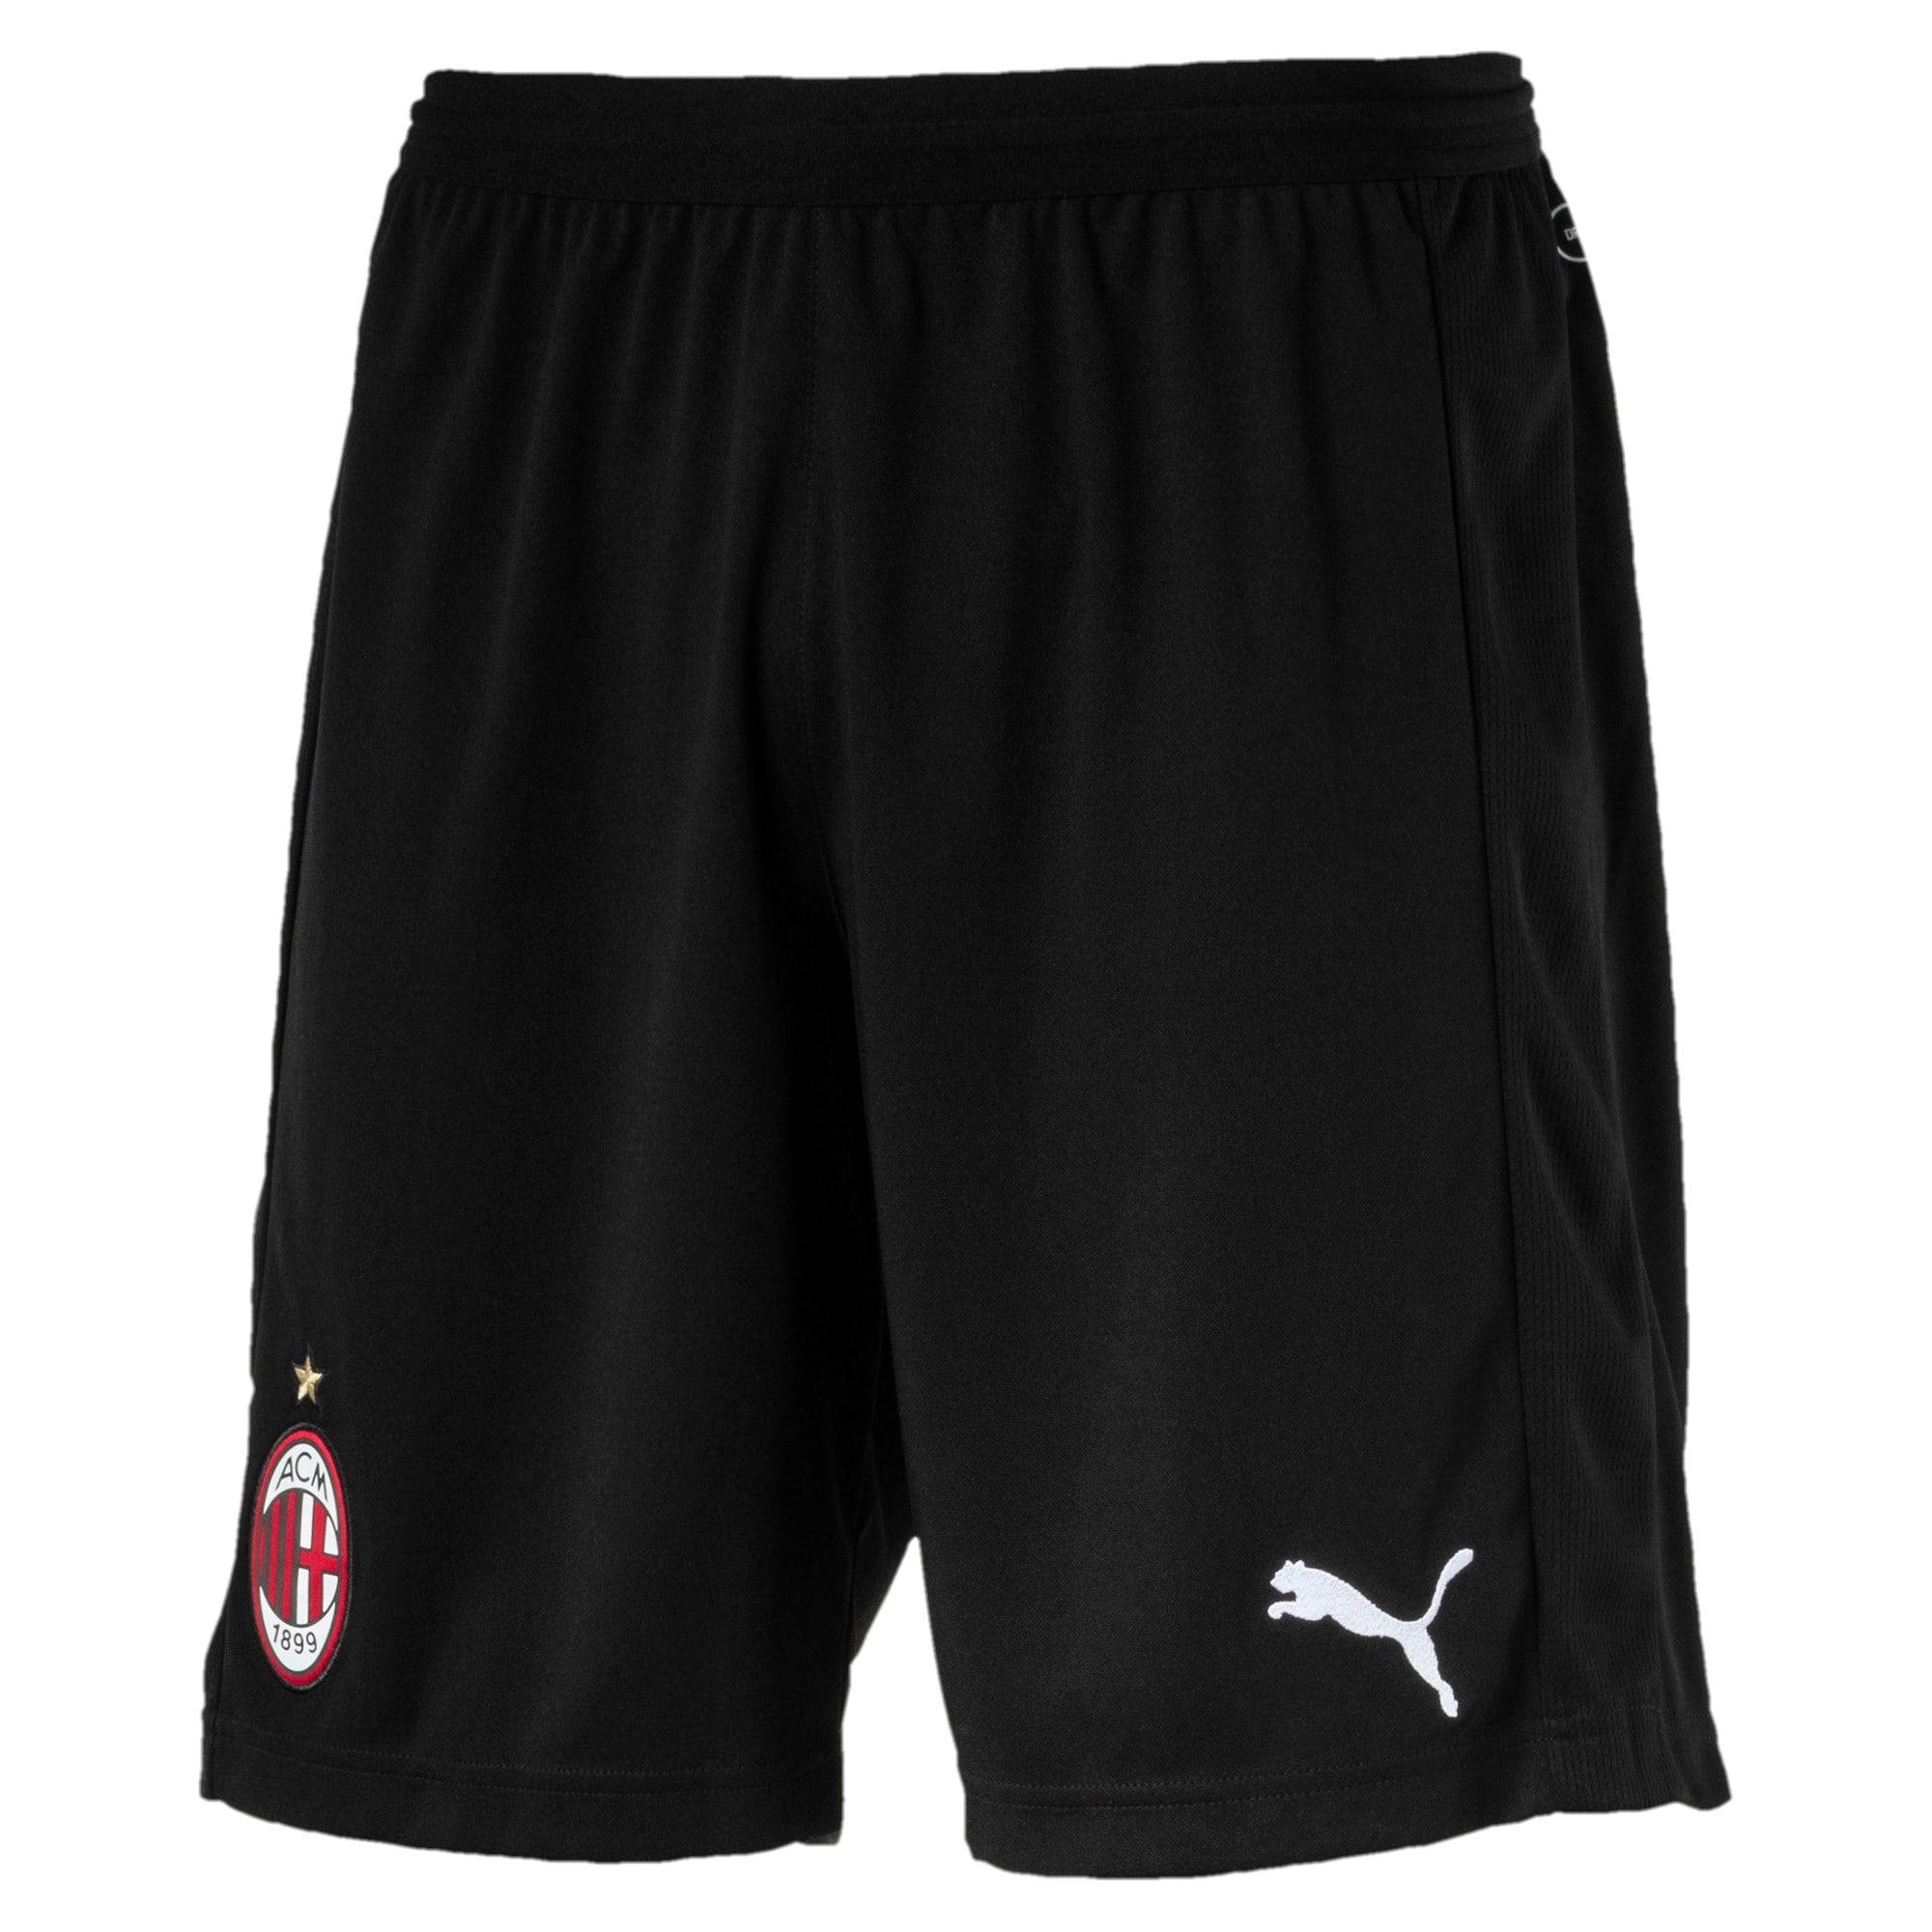 Thumbnail 1 of AC Milan Men's Replica Shorts, Puma Black-Puma White, medium